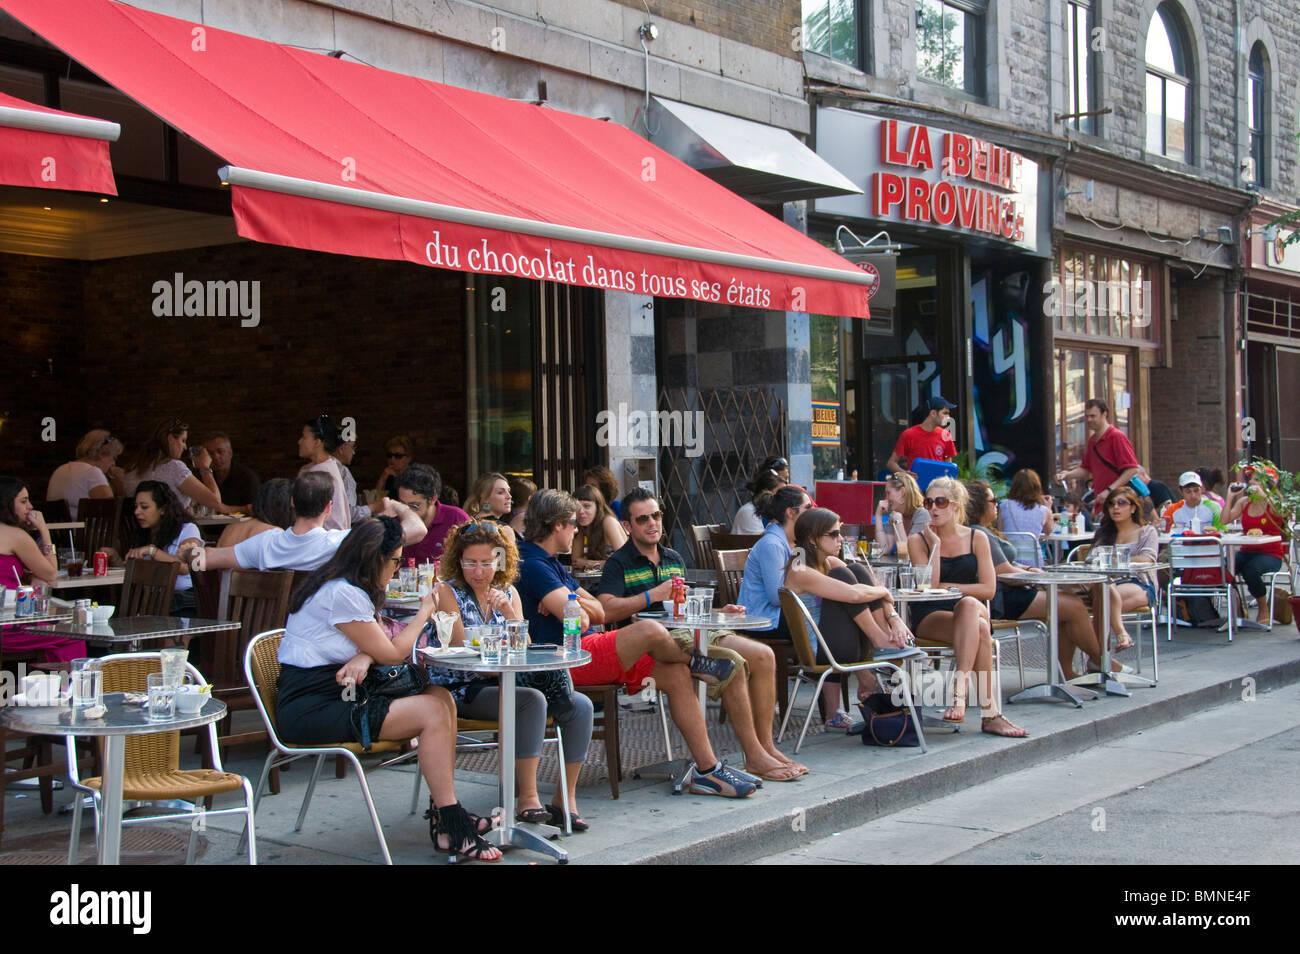 Sidewalk café on Saint Laurent boulevard Montreal Canada - Stock Image